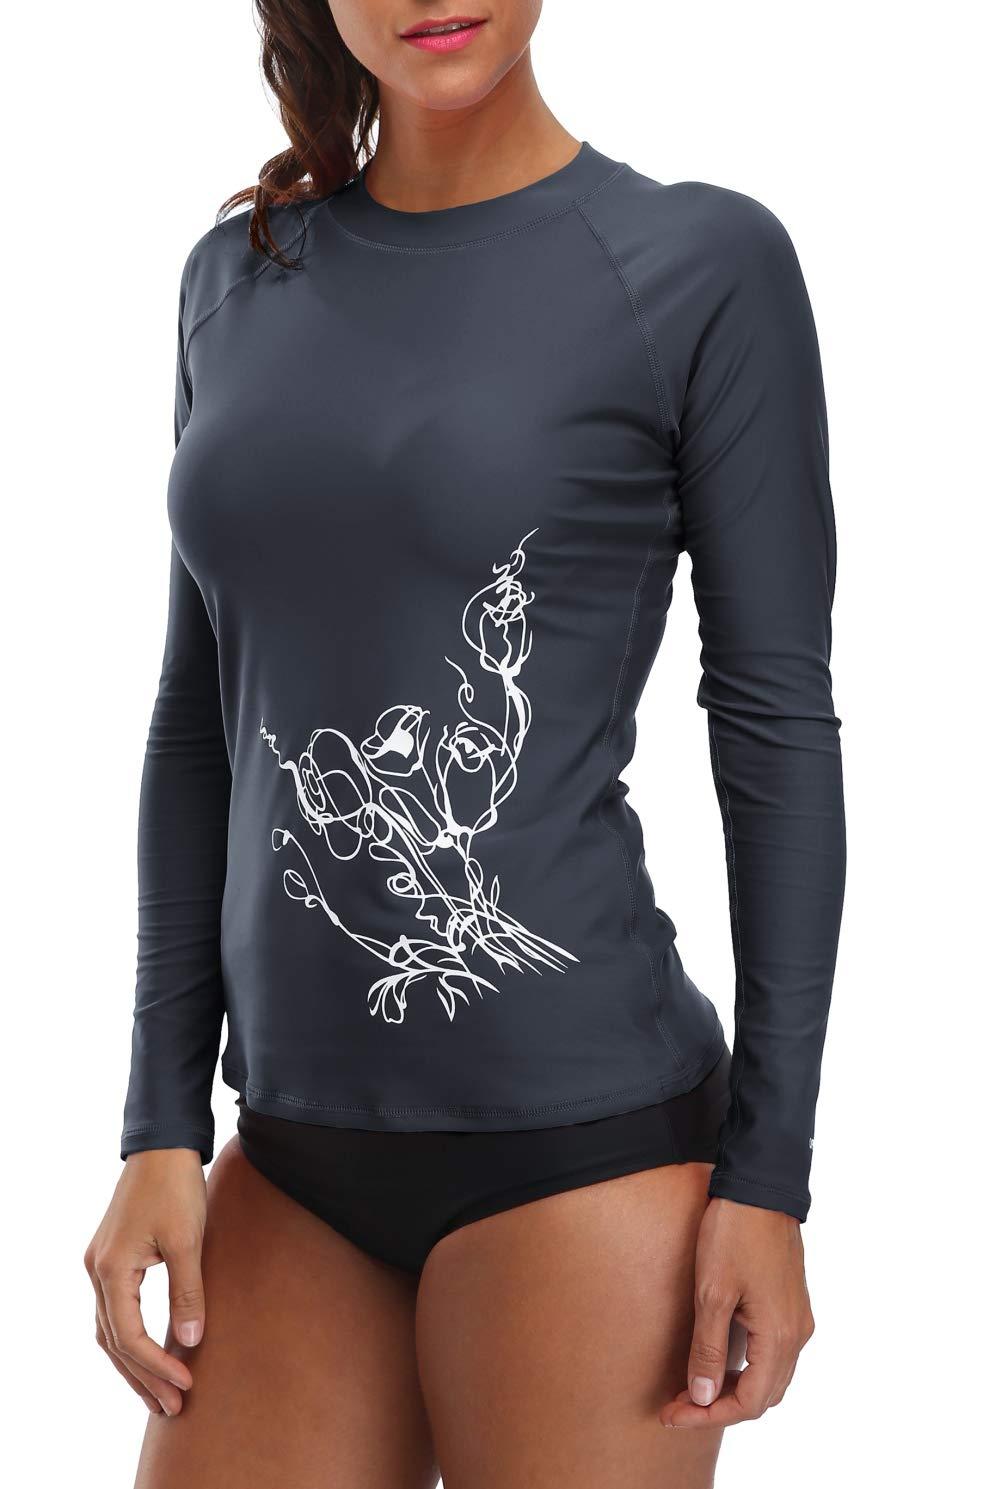 beautyin Women's Long-Sleeve Rashguard UPF 50+ Swimwear Rash Guard Athletic Tops